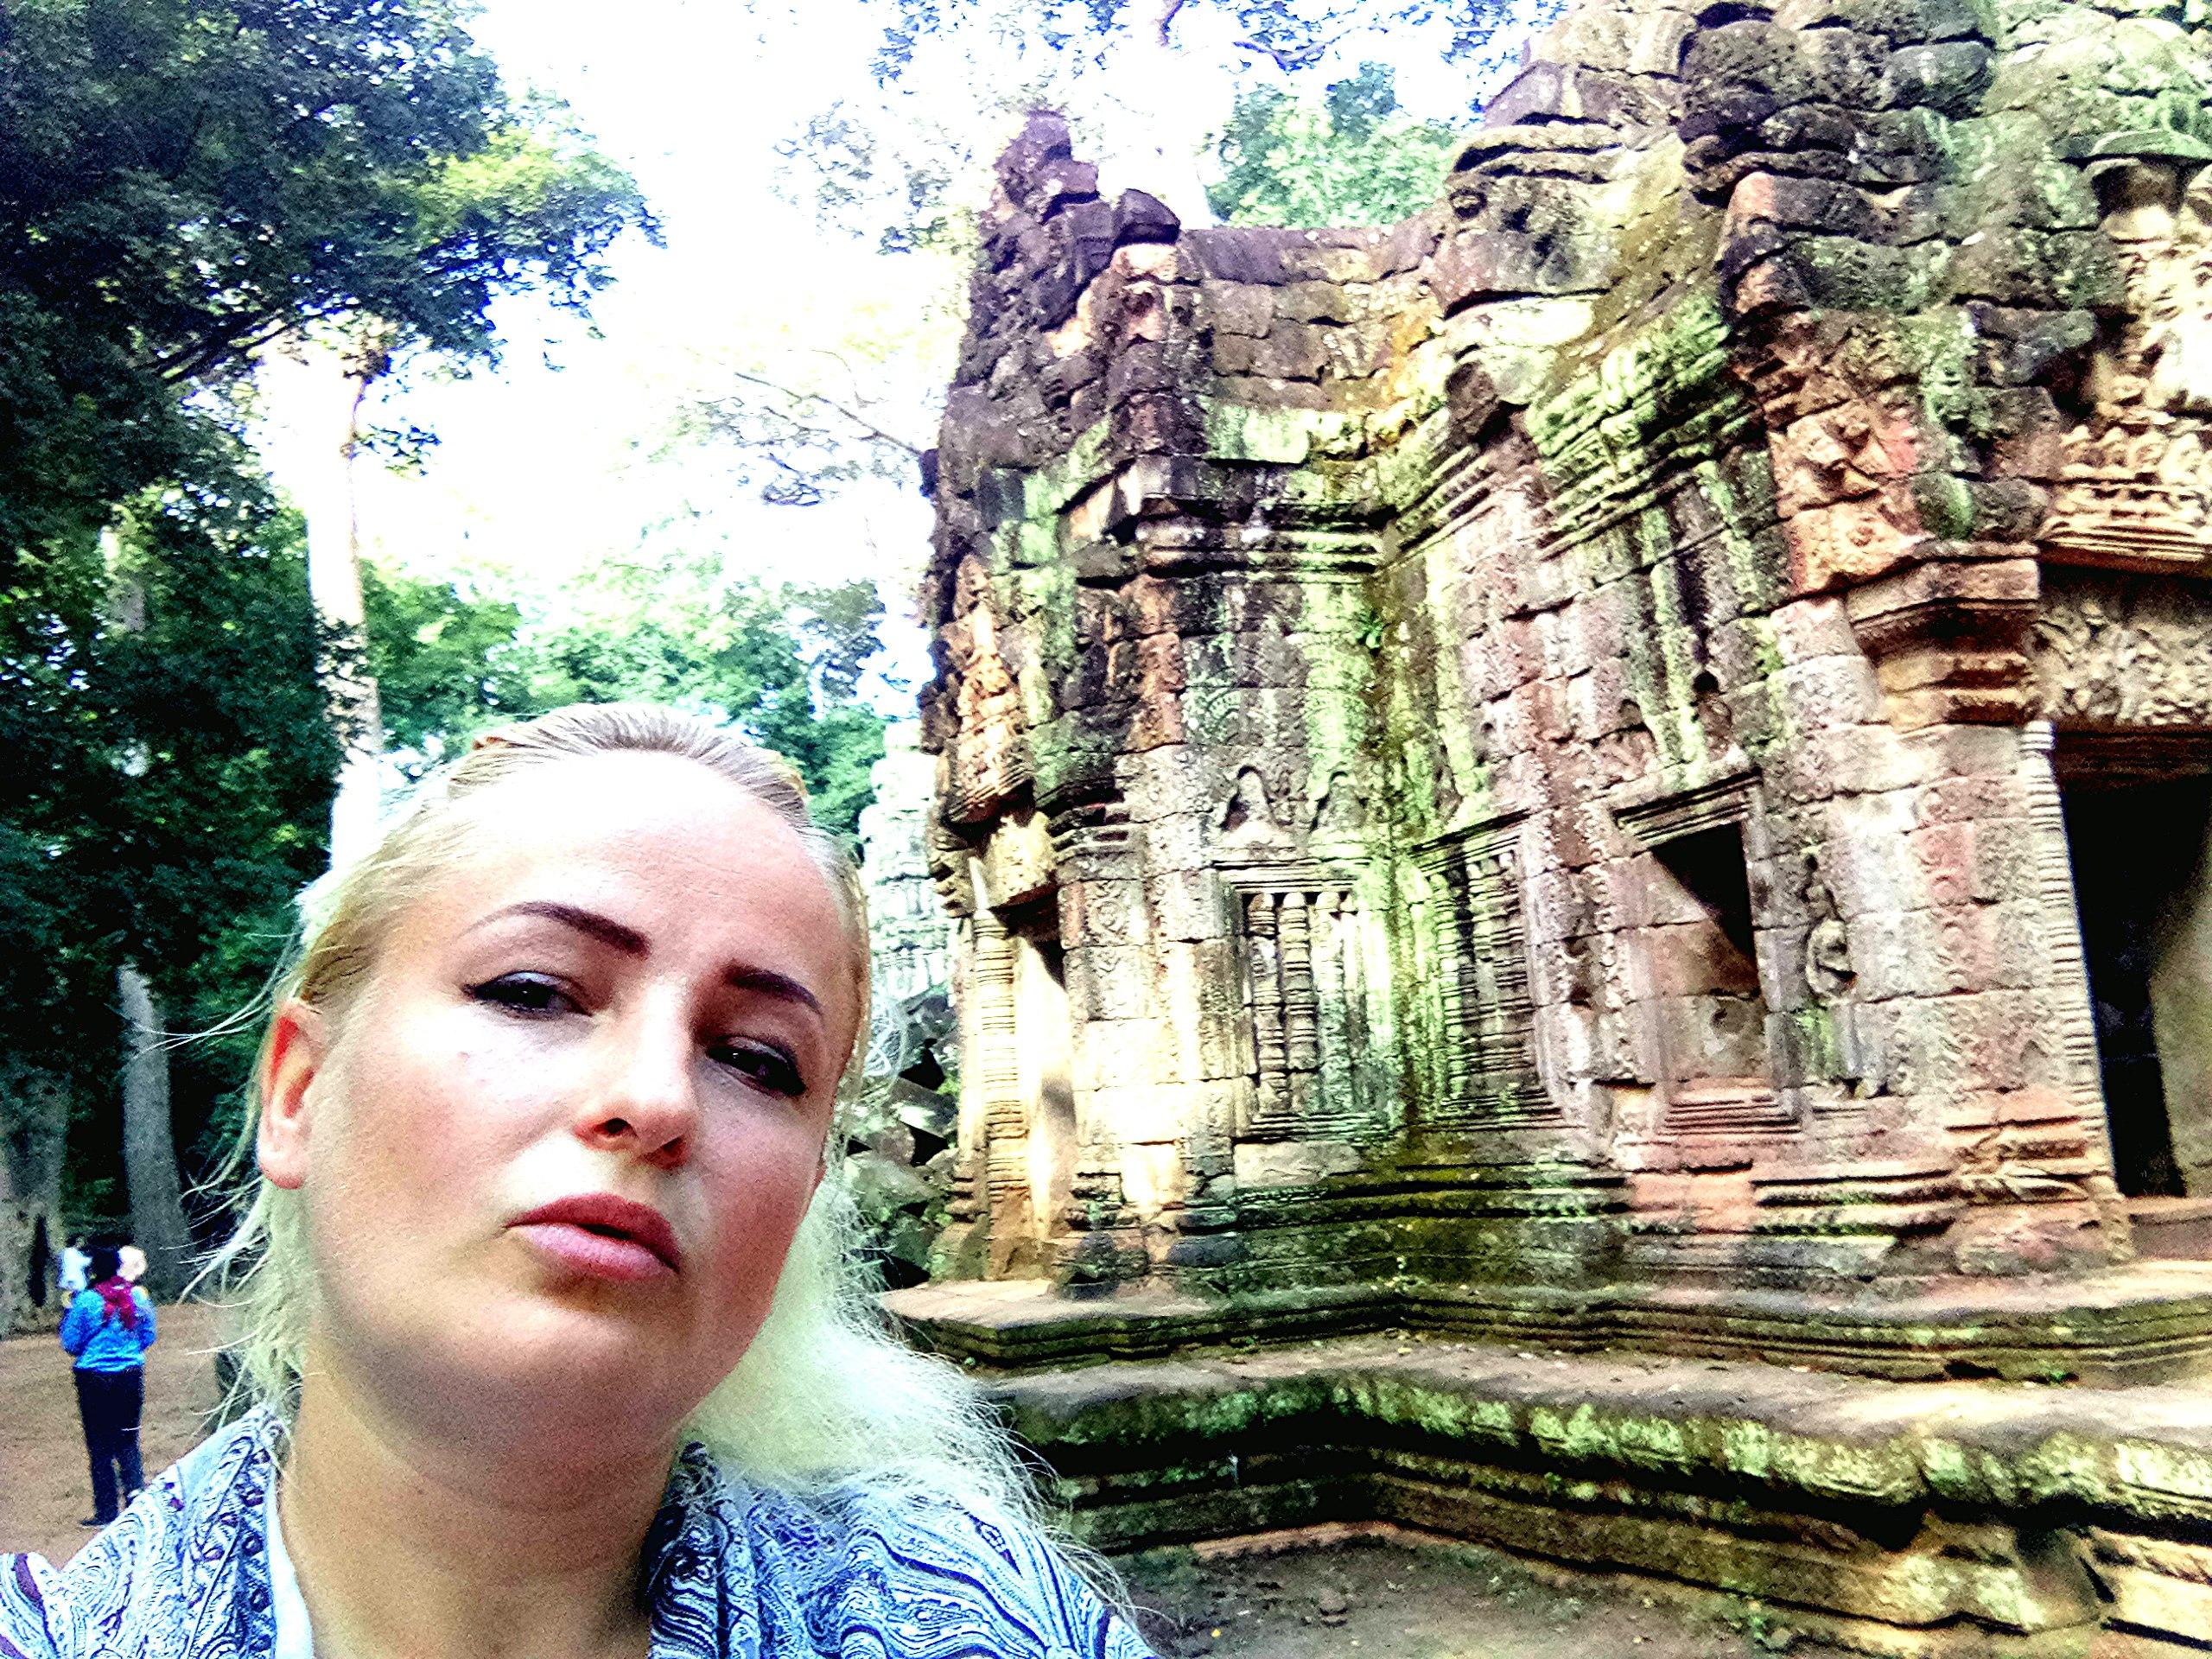 Елена Руденко (Валтея). Камбоджа. Ангкор. - Страница 3 Mja0PH6TG_o